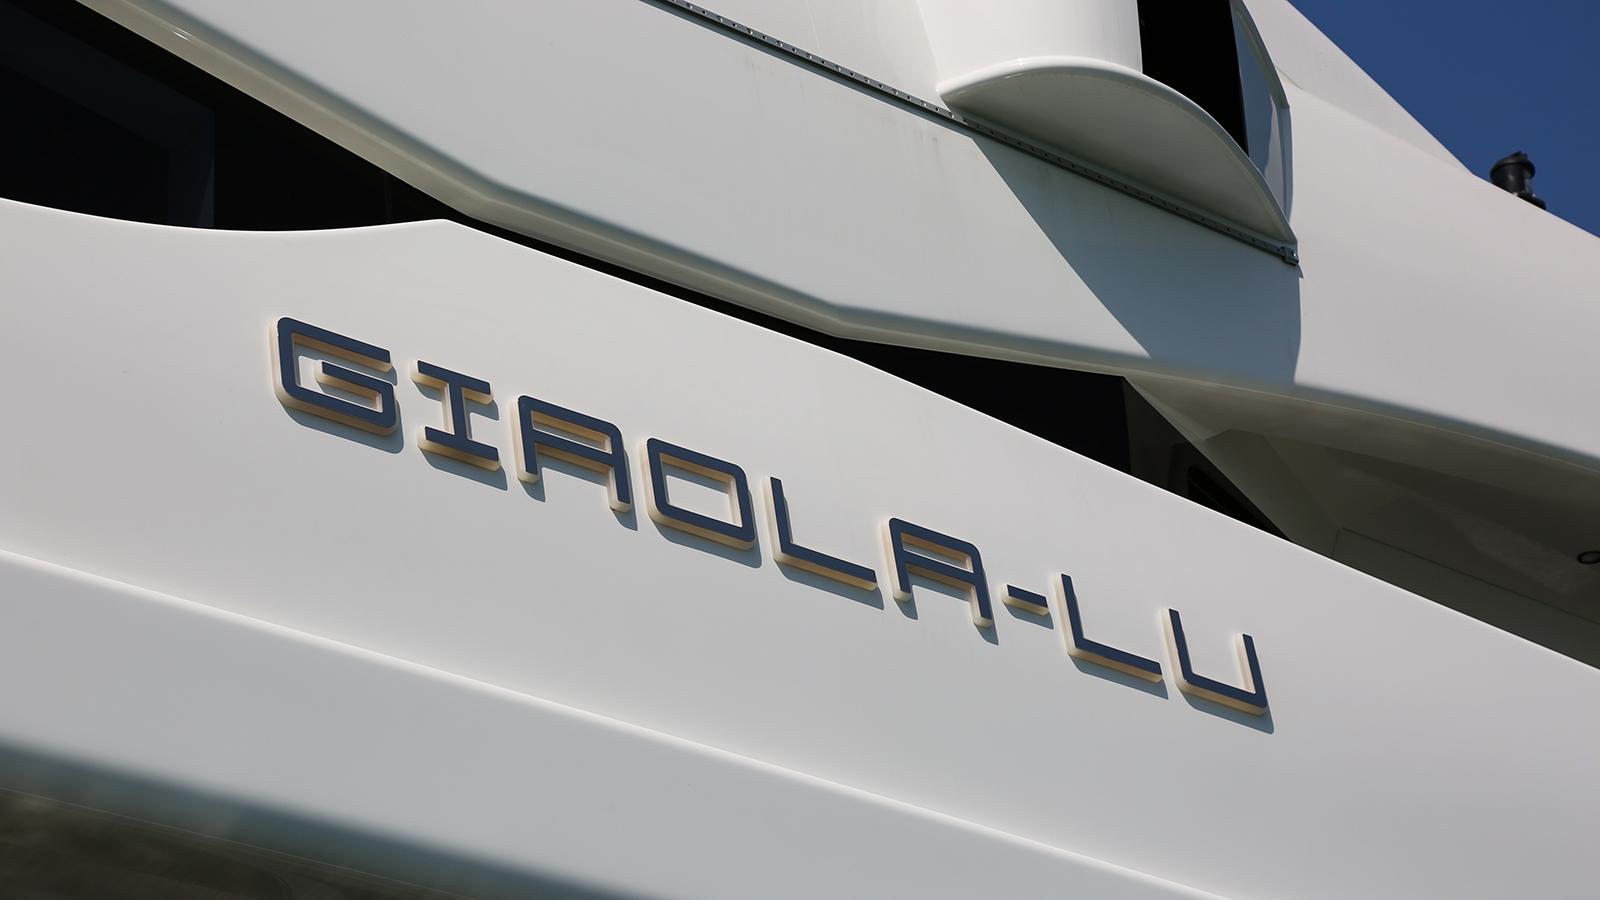 Bilgin-155-super-yacht-giaola-lu-superstructure